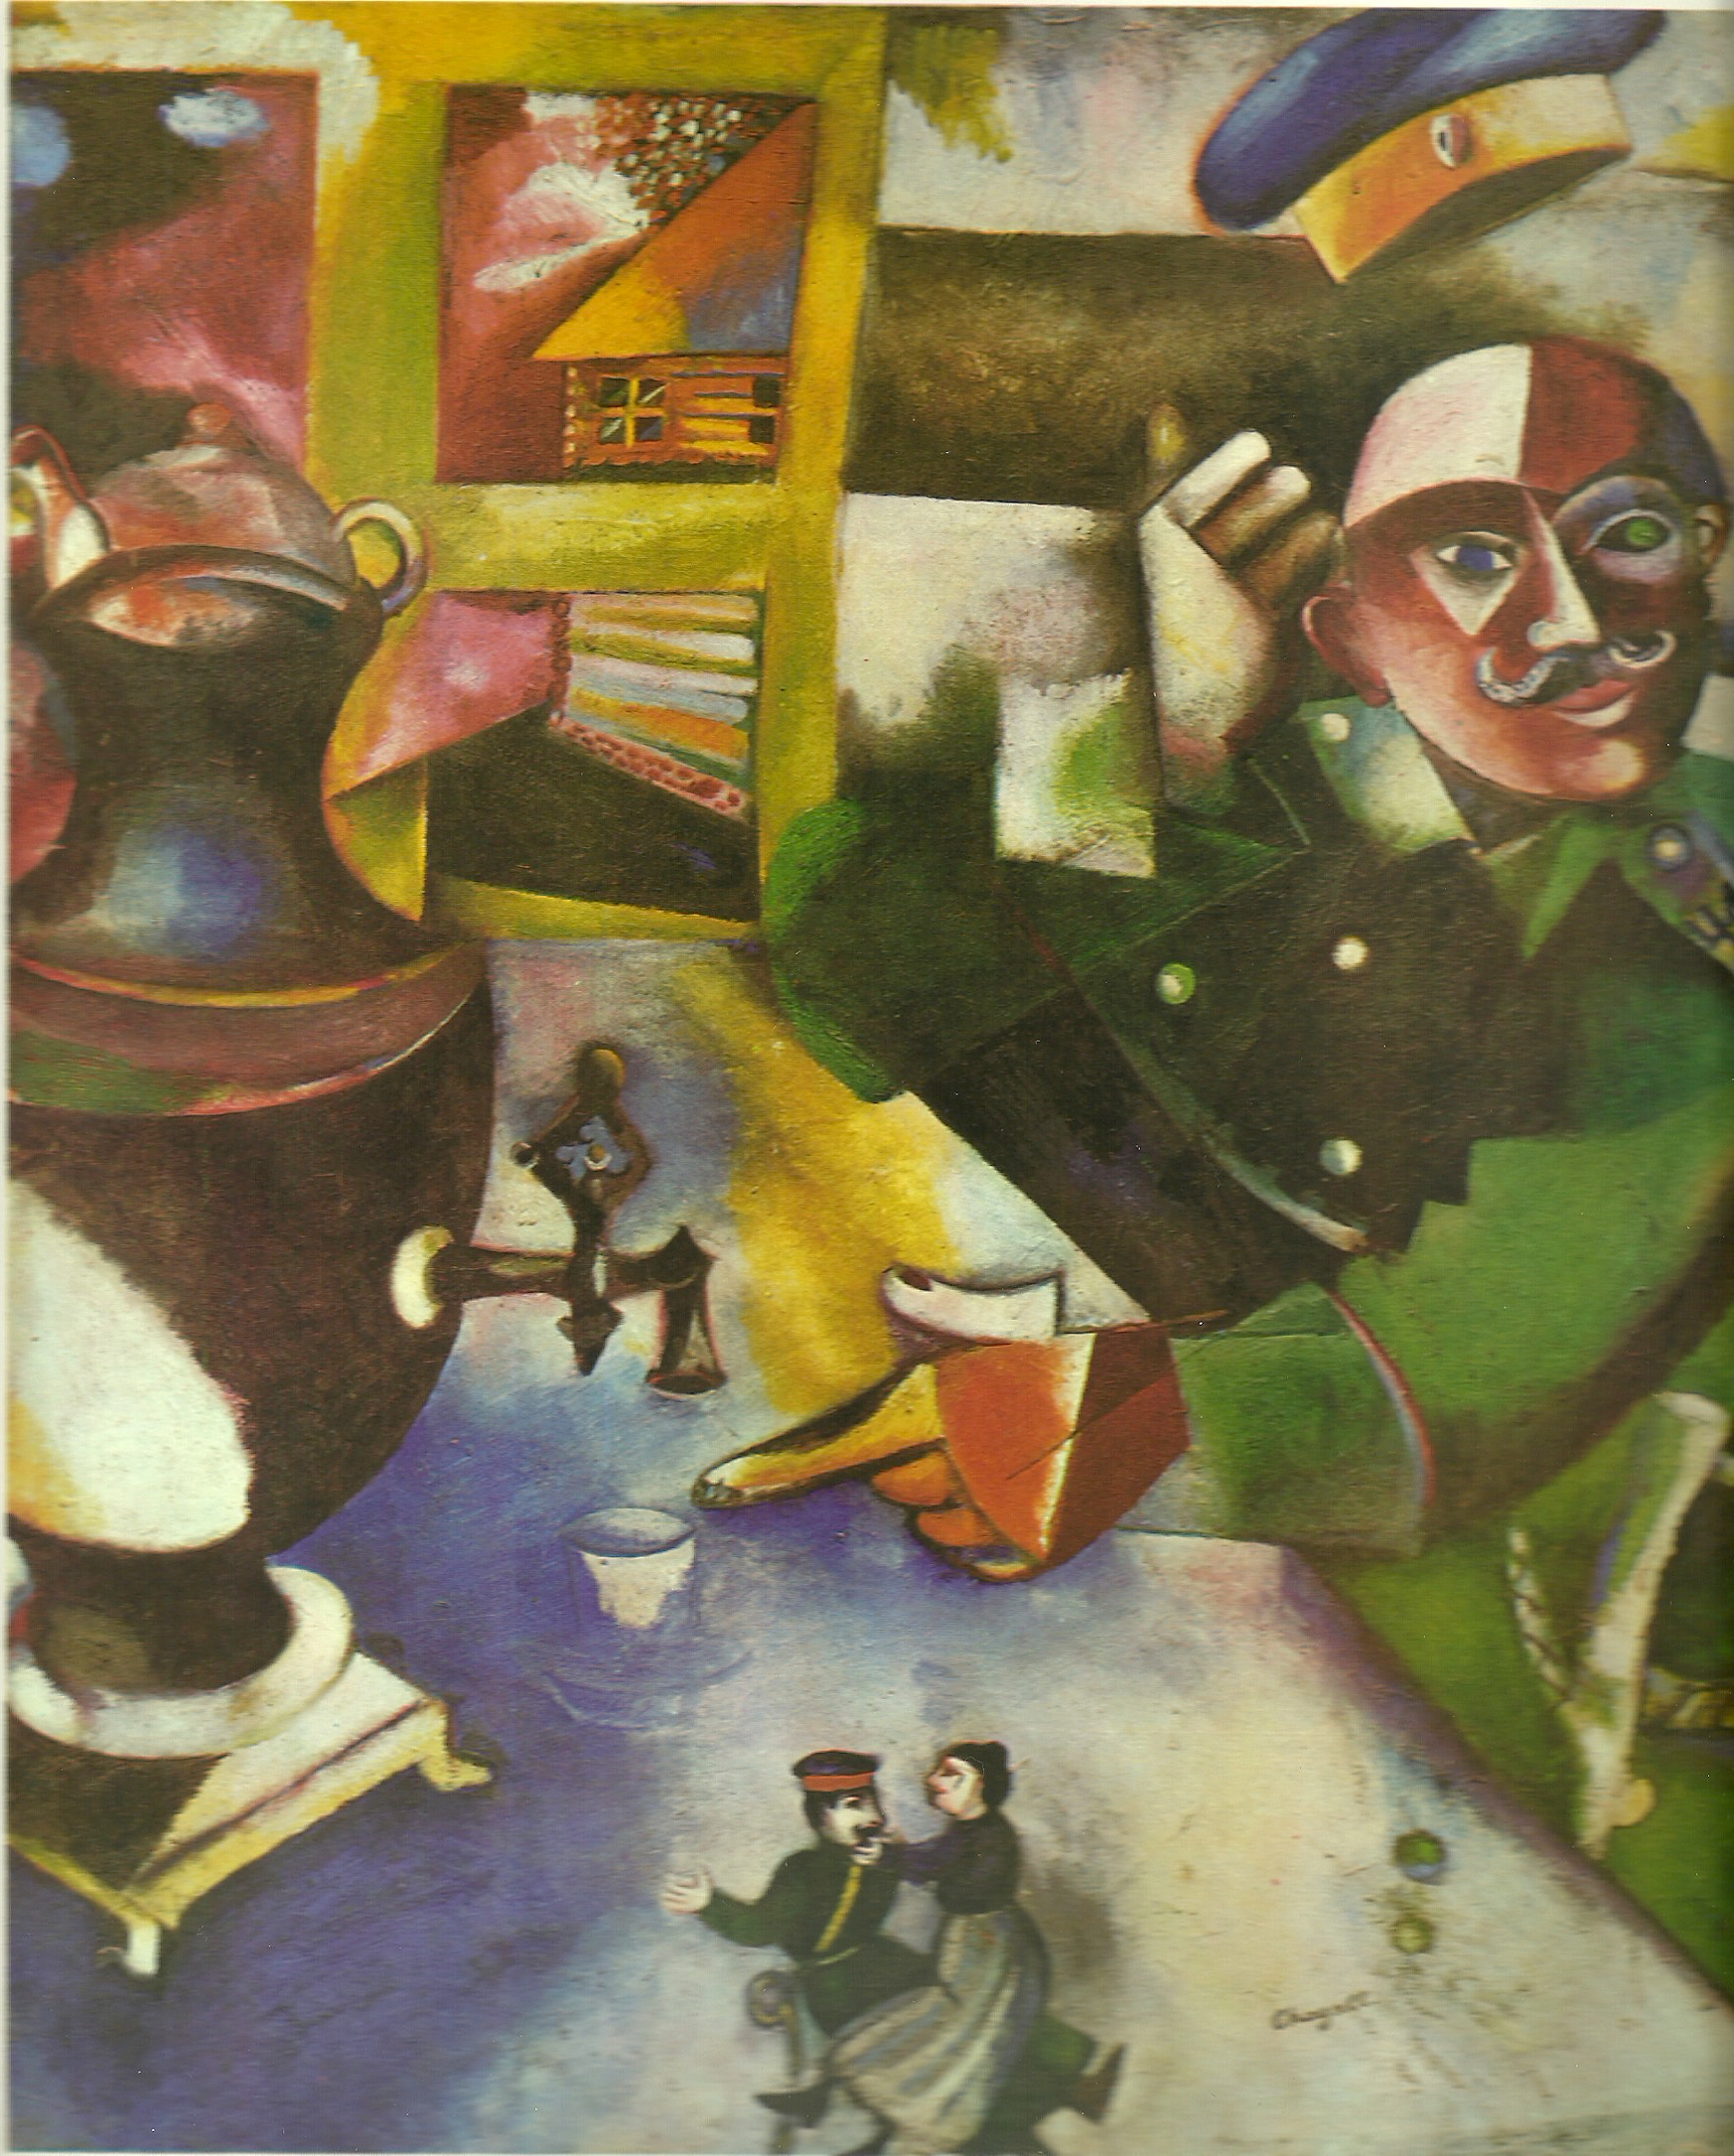 O expressionismo na pintura